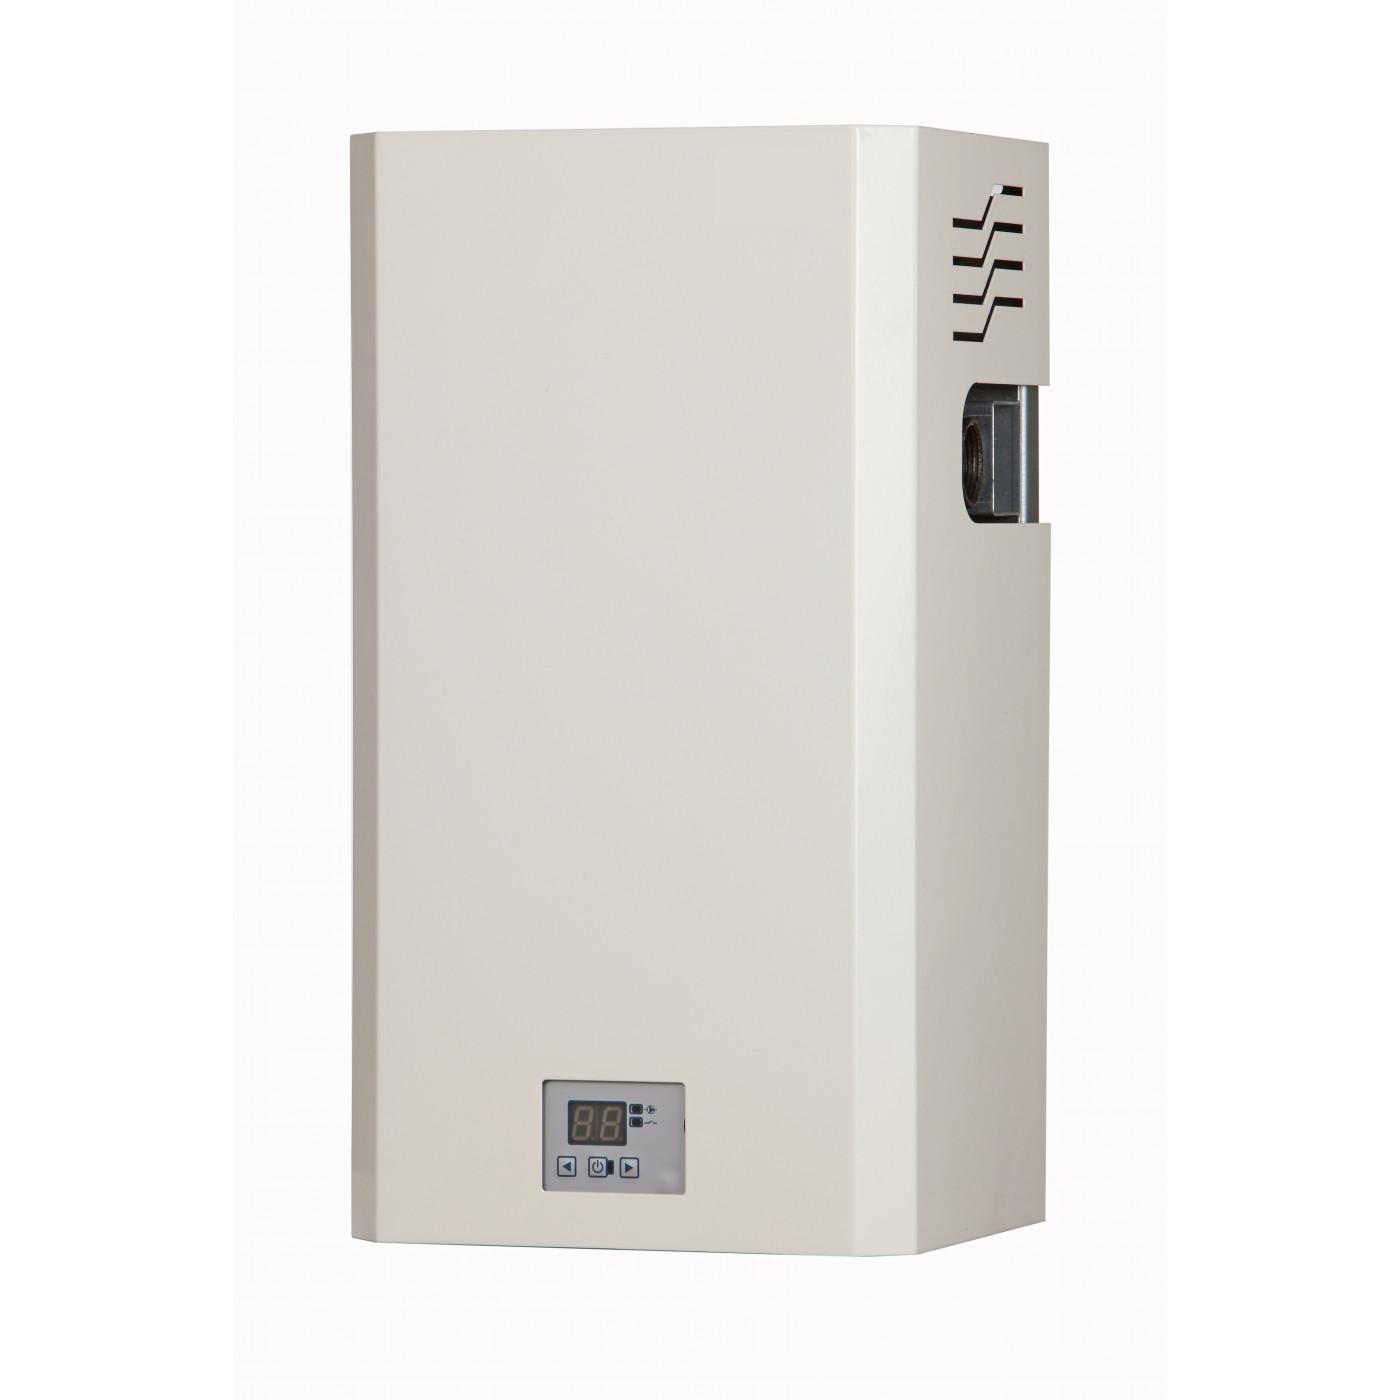 Elektrokessel 6 kW Heiztherme Elektro Heizanlage Elektrozentralheizung Therme